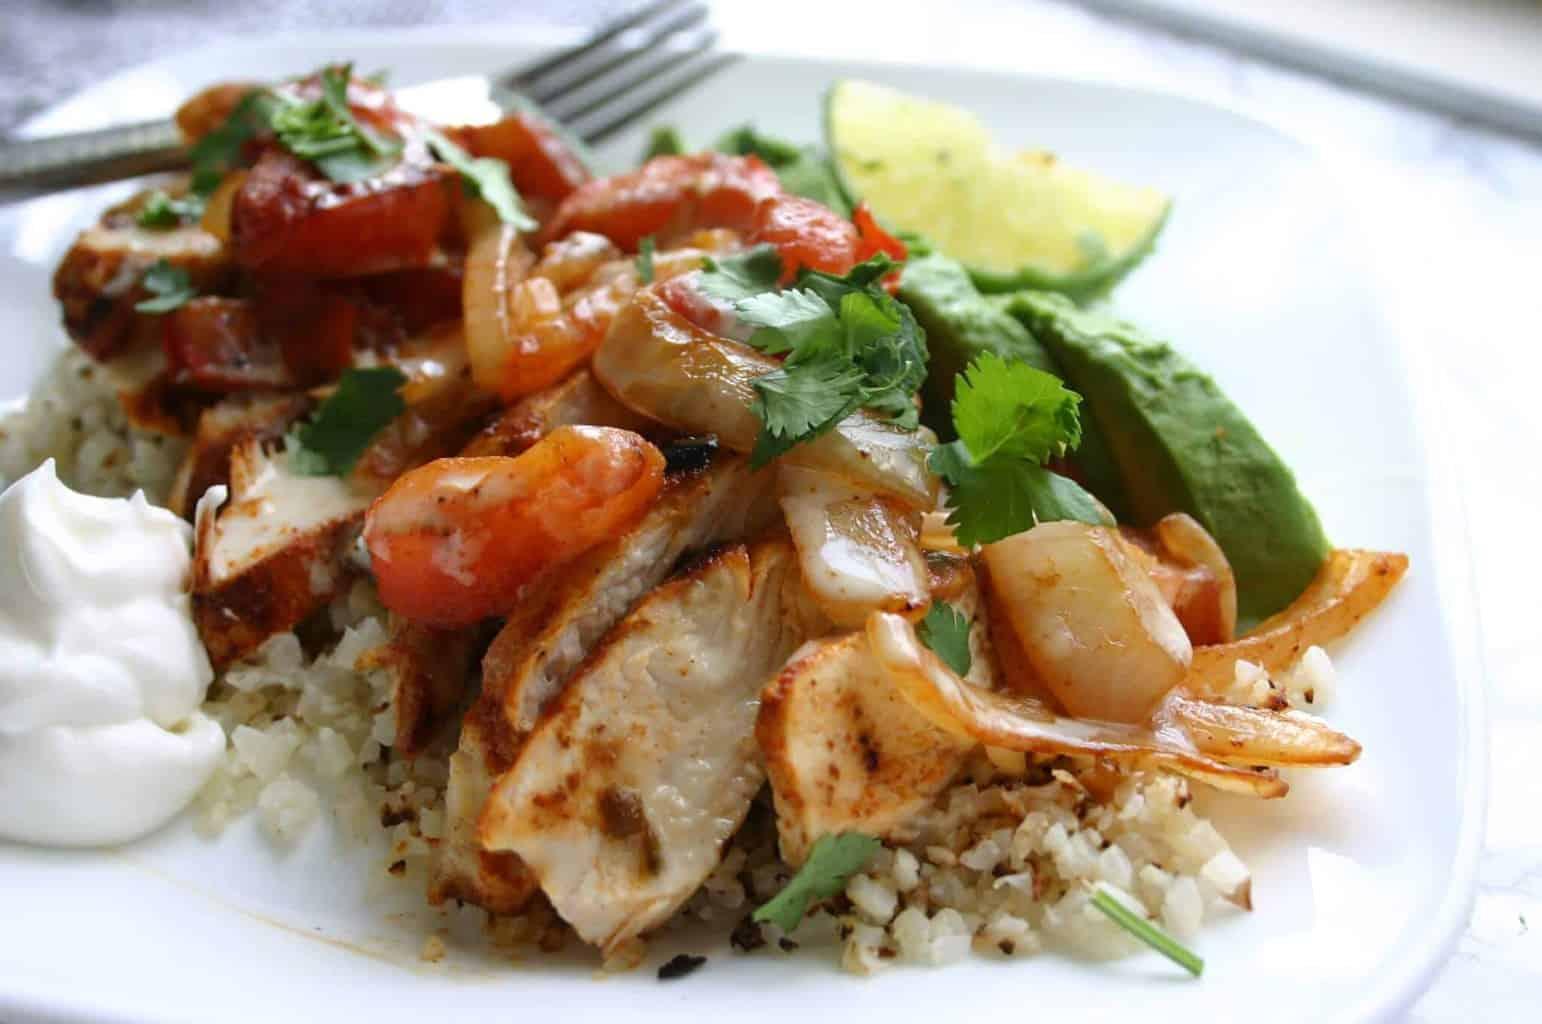 Mexican fajita chicken over cauliflower rice - low carb cauliflower rice recipes!